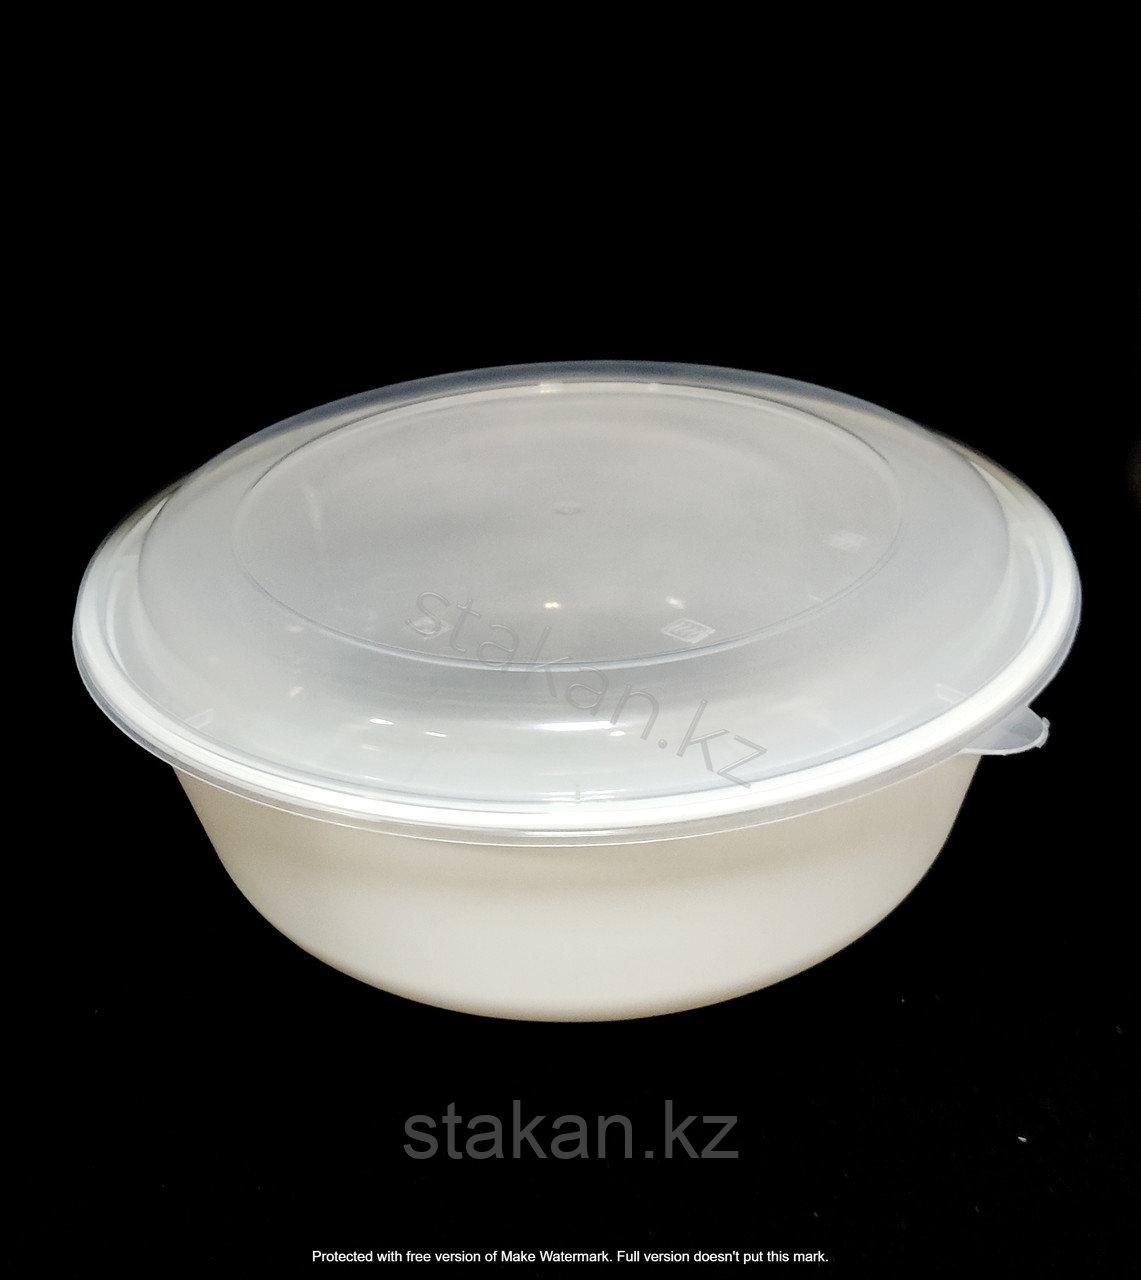 Контейнер круглый с крышкой (Супница 2500мл) БЕЛЫЙ